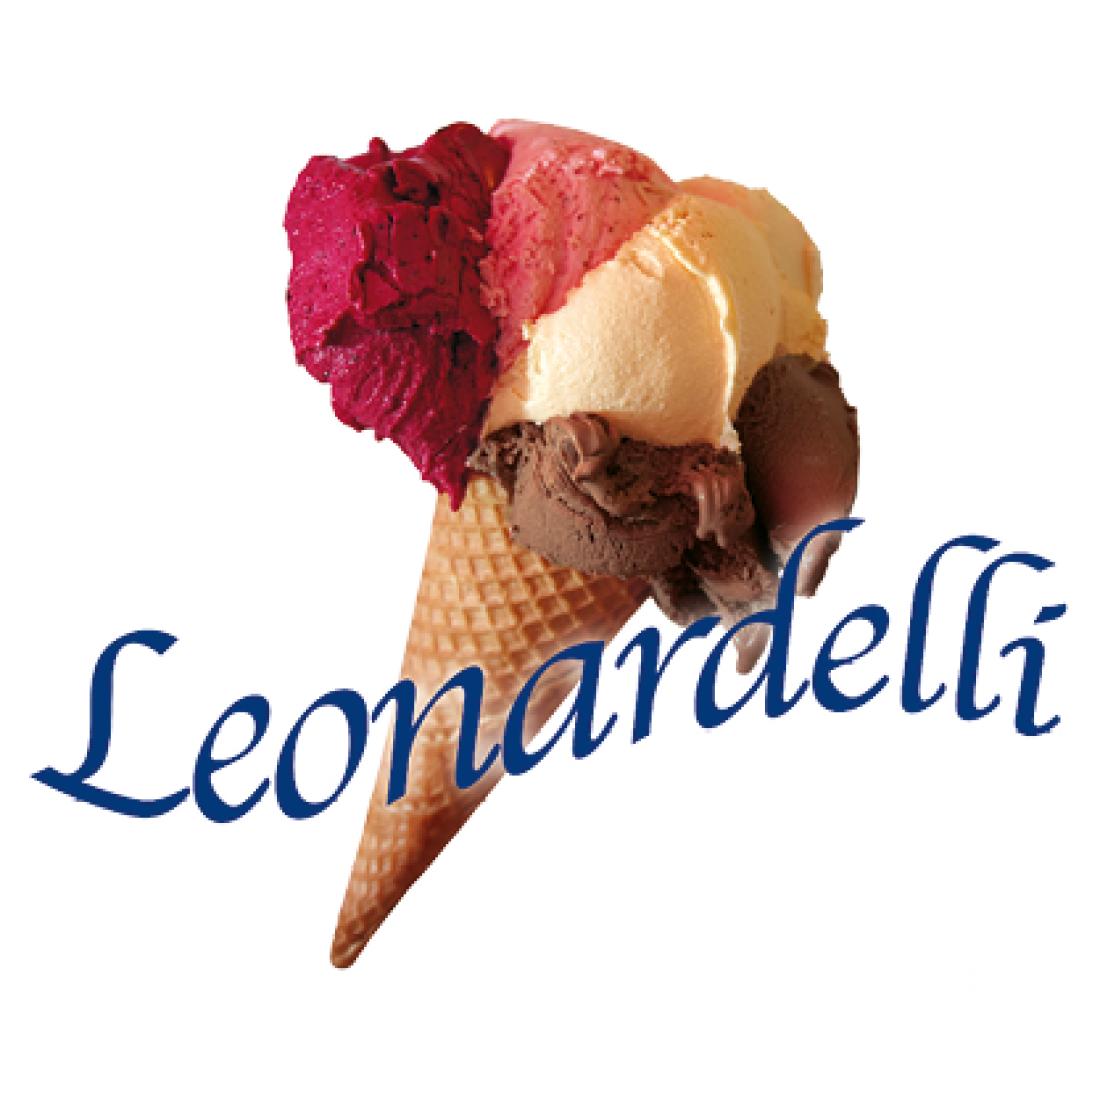 Logo Leonardelli La Gelateria